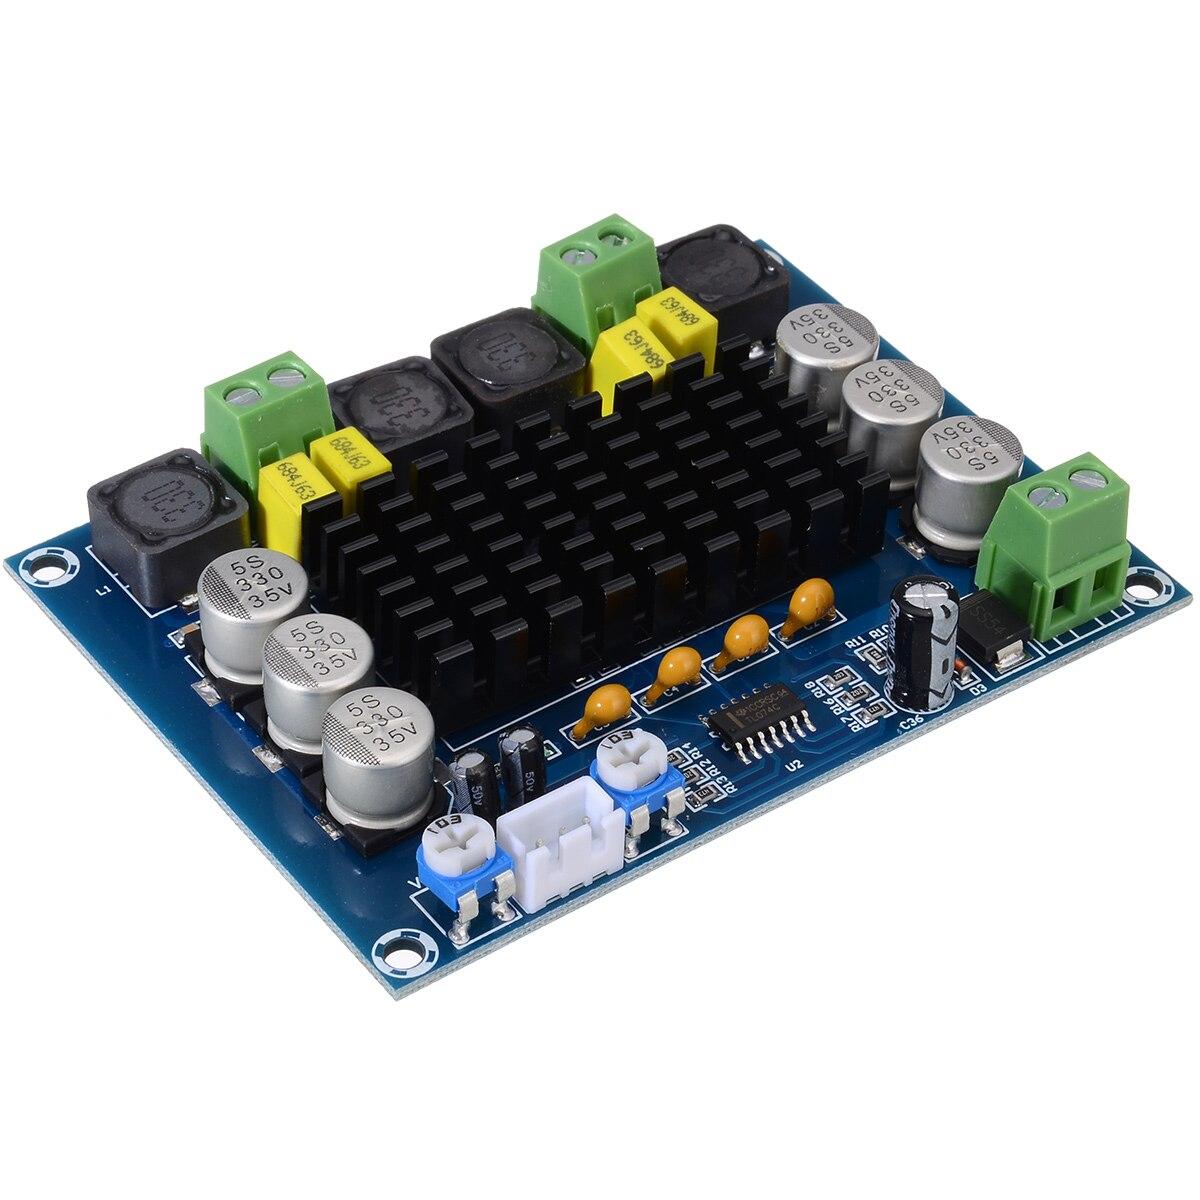 Onsale cc 12-26V TPA3116D2 Placa de amplificadores XH-M543 de doble canal estéreo de alta potencia Digital Audio amplificador de potencia placas 2x120W